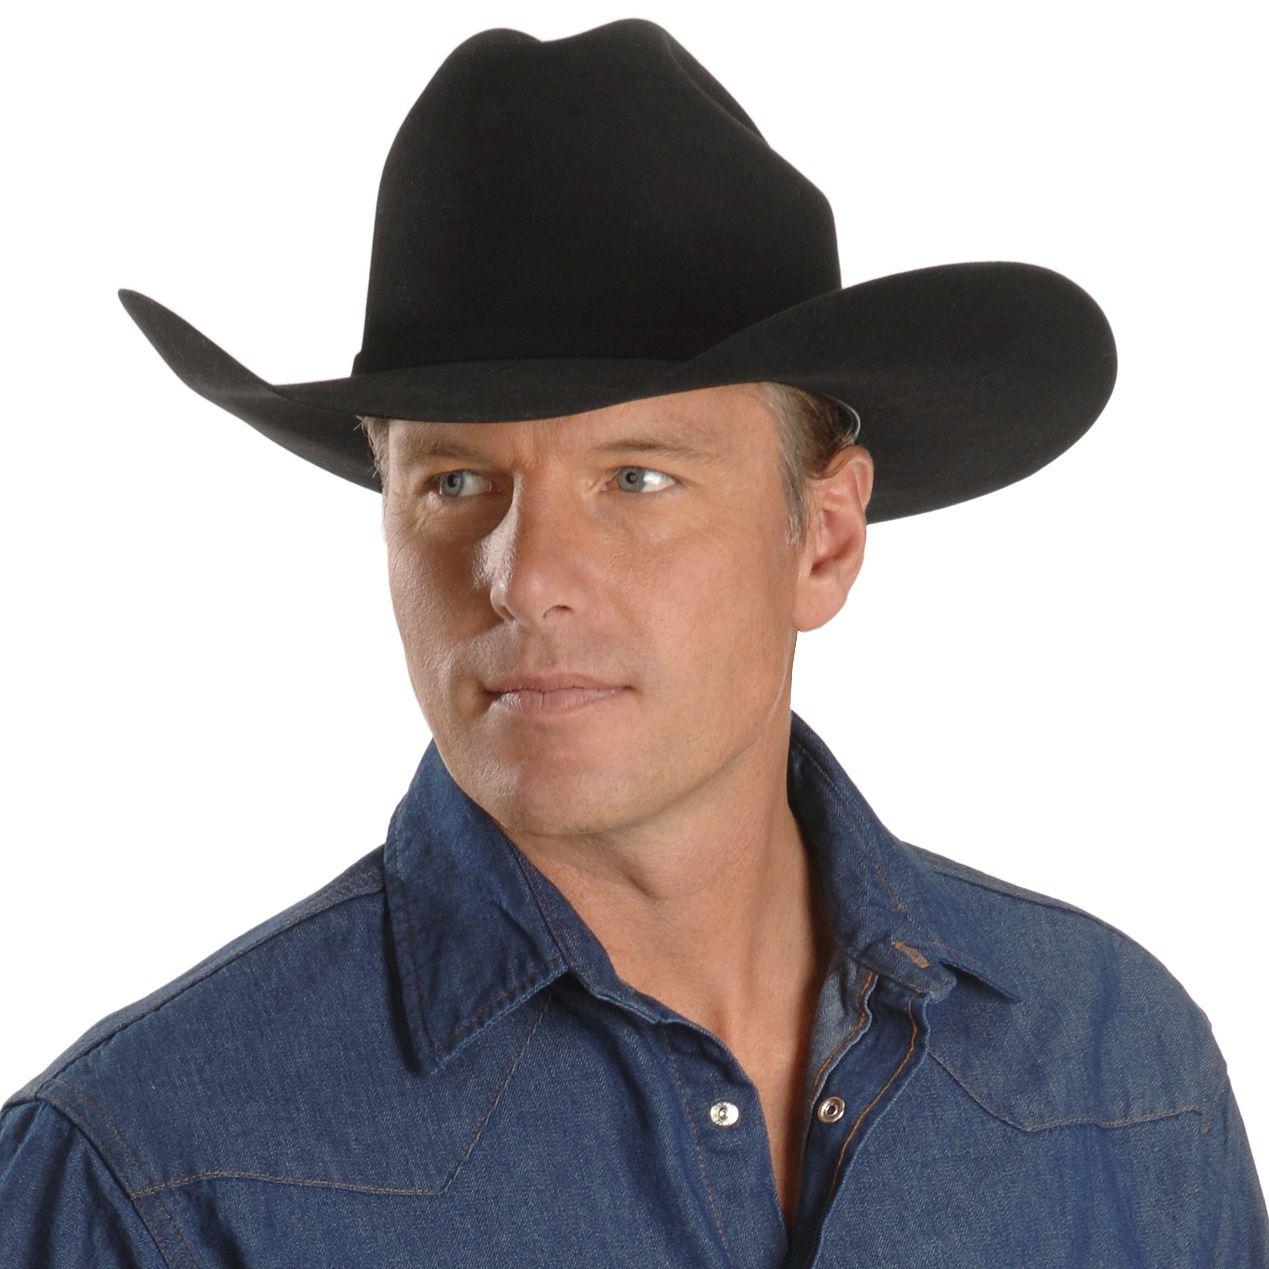 19d83d558c8 Justin 20X Fur Felt Cowboy Hat - Country Outfitter